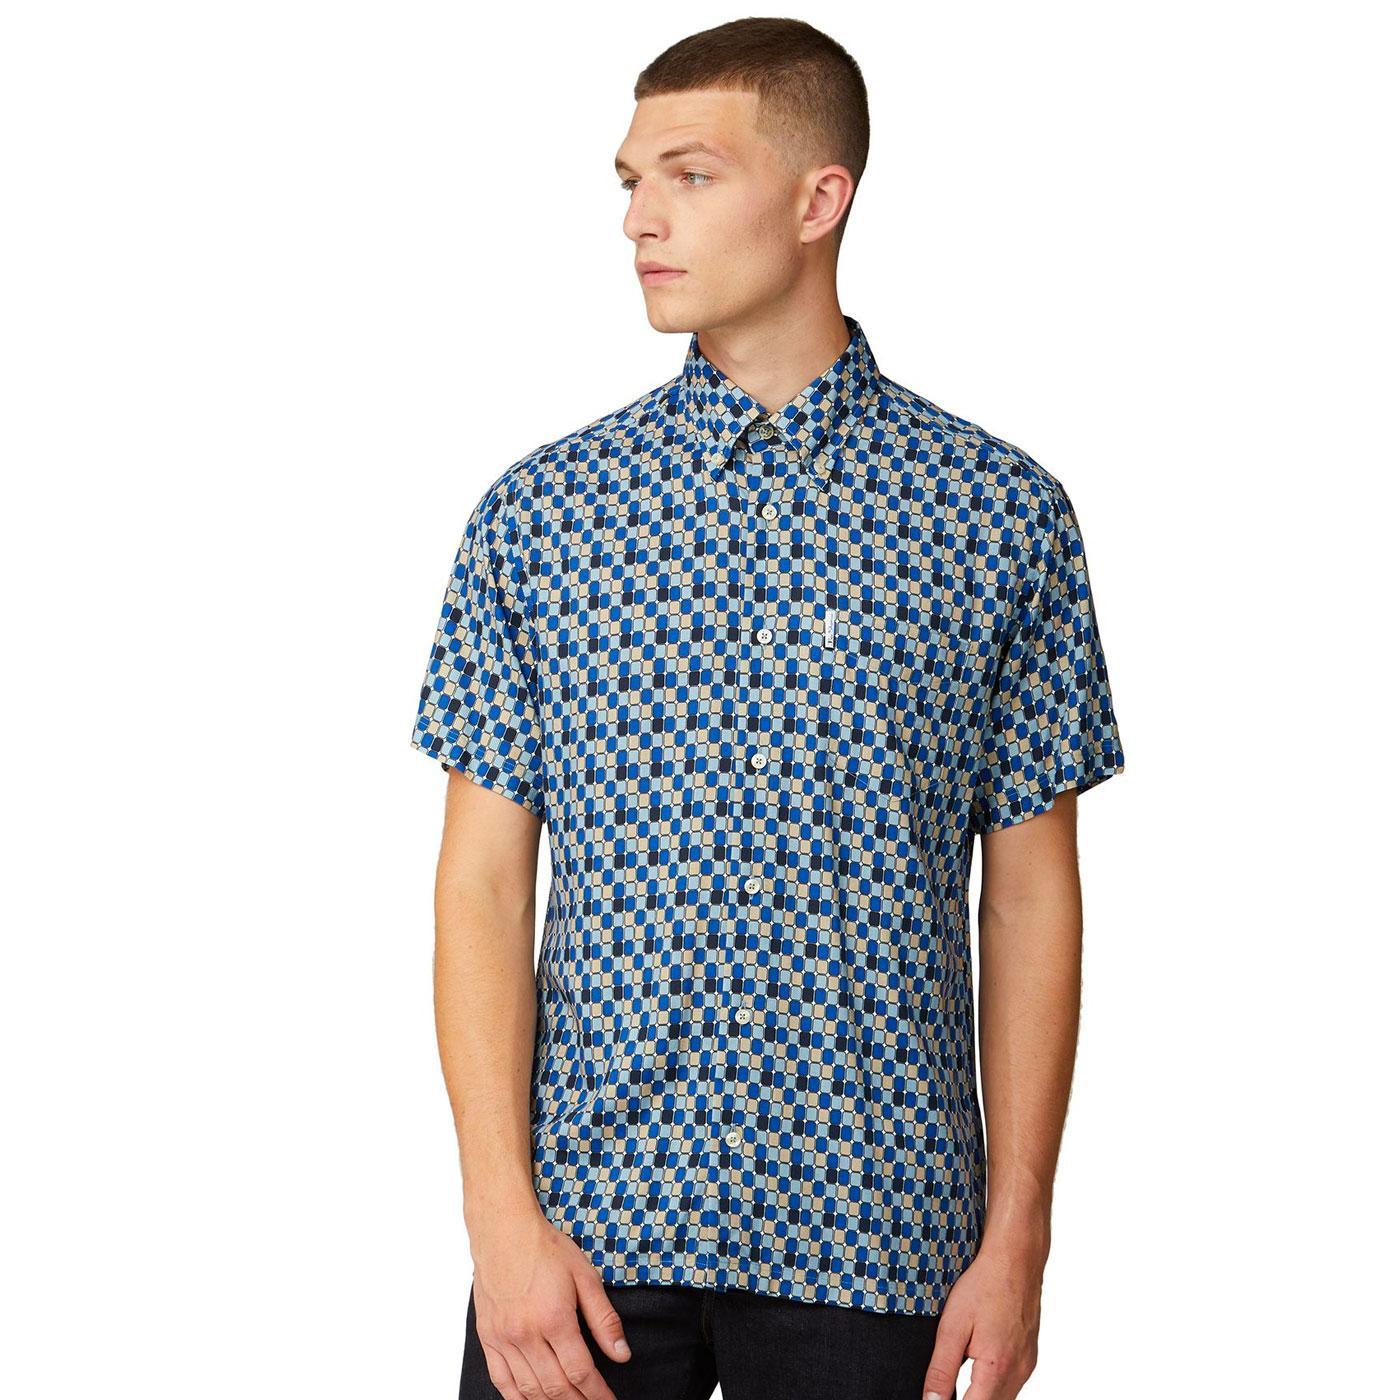 BEN SHERMAN ARCHIVE 90s Retro Short Sleeve Shirt